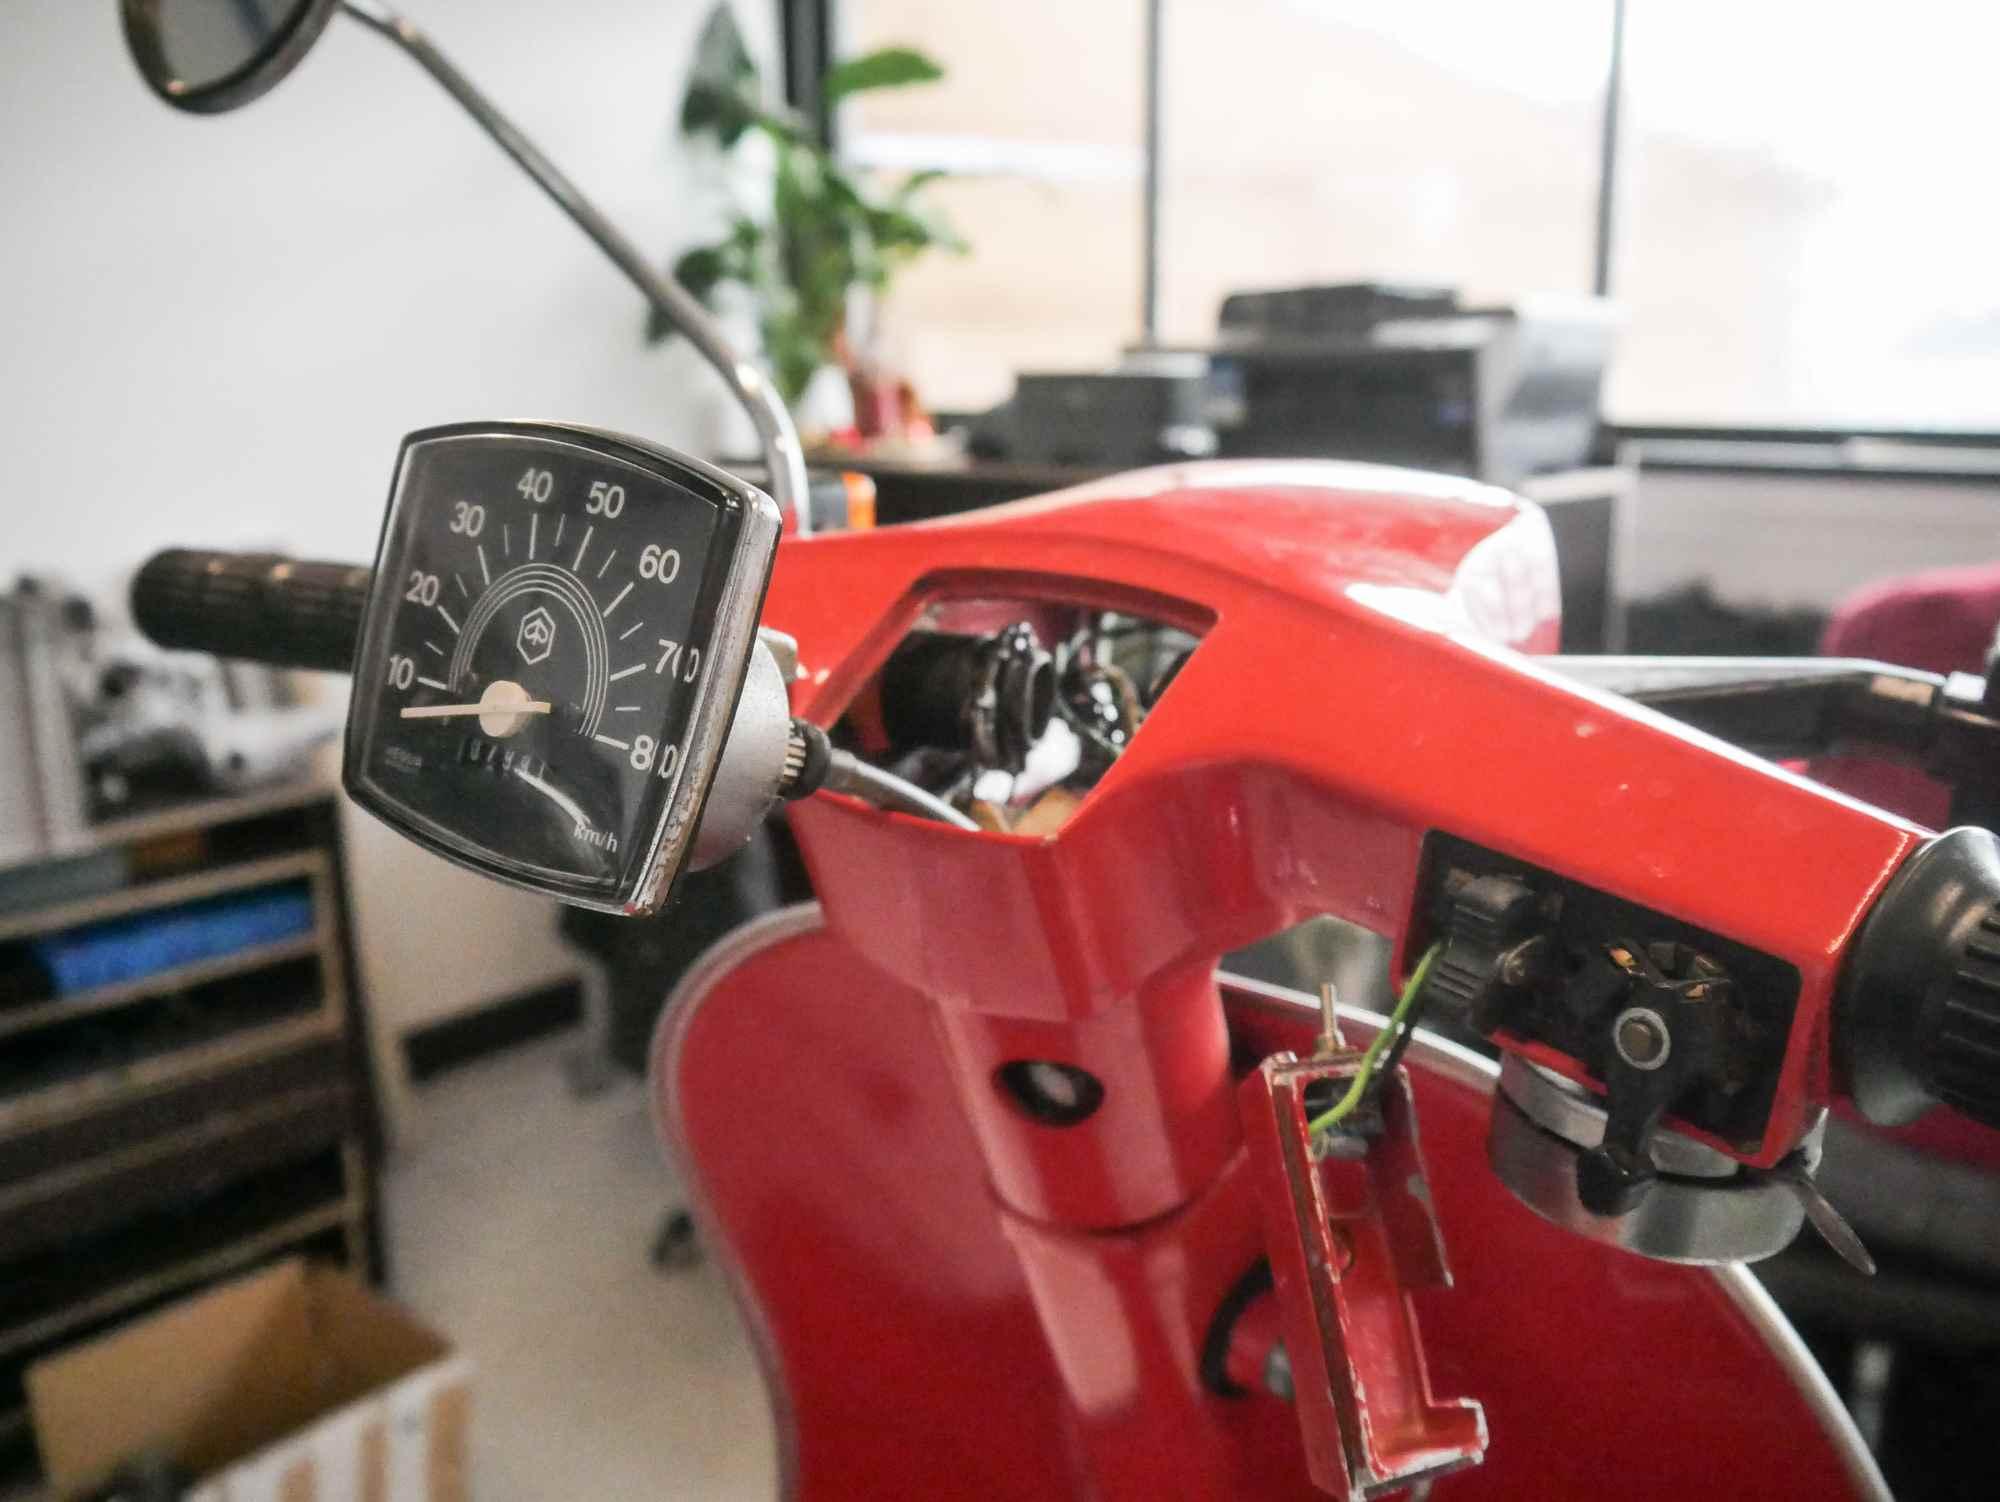 Vespa V50 Spezial Lenker mit Tacho und Kabeln